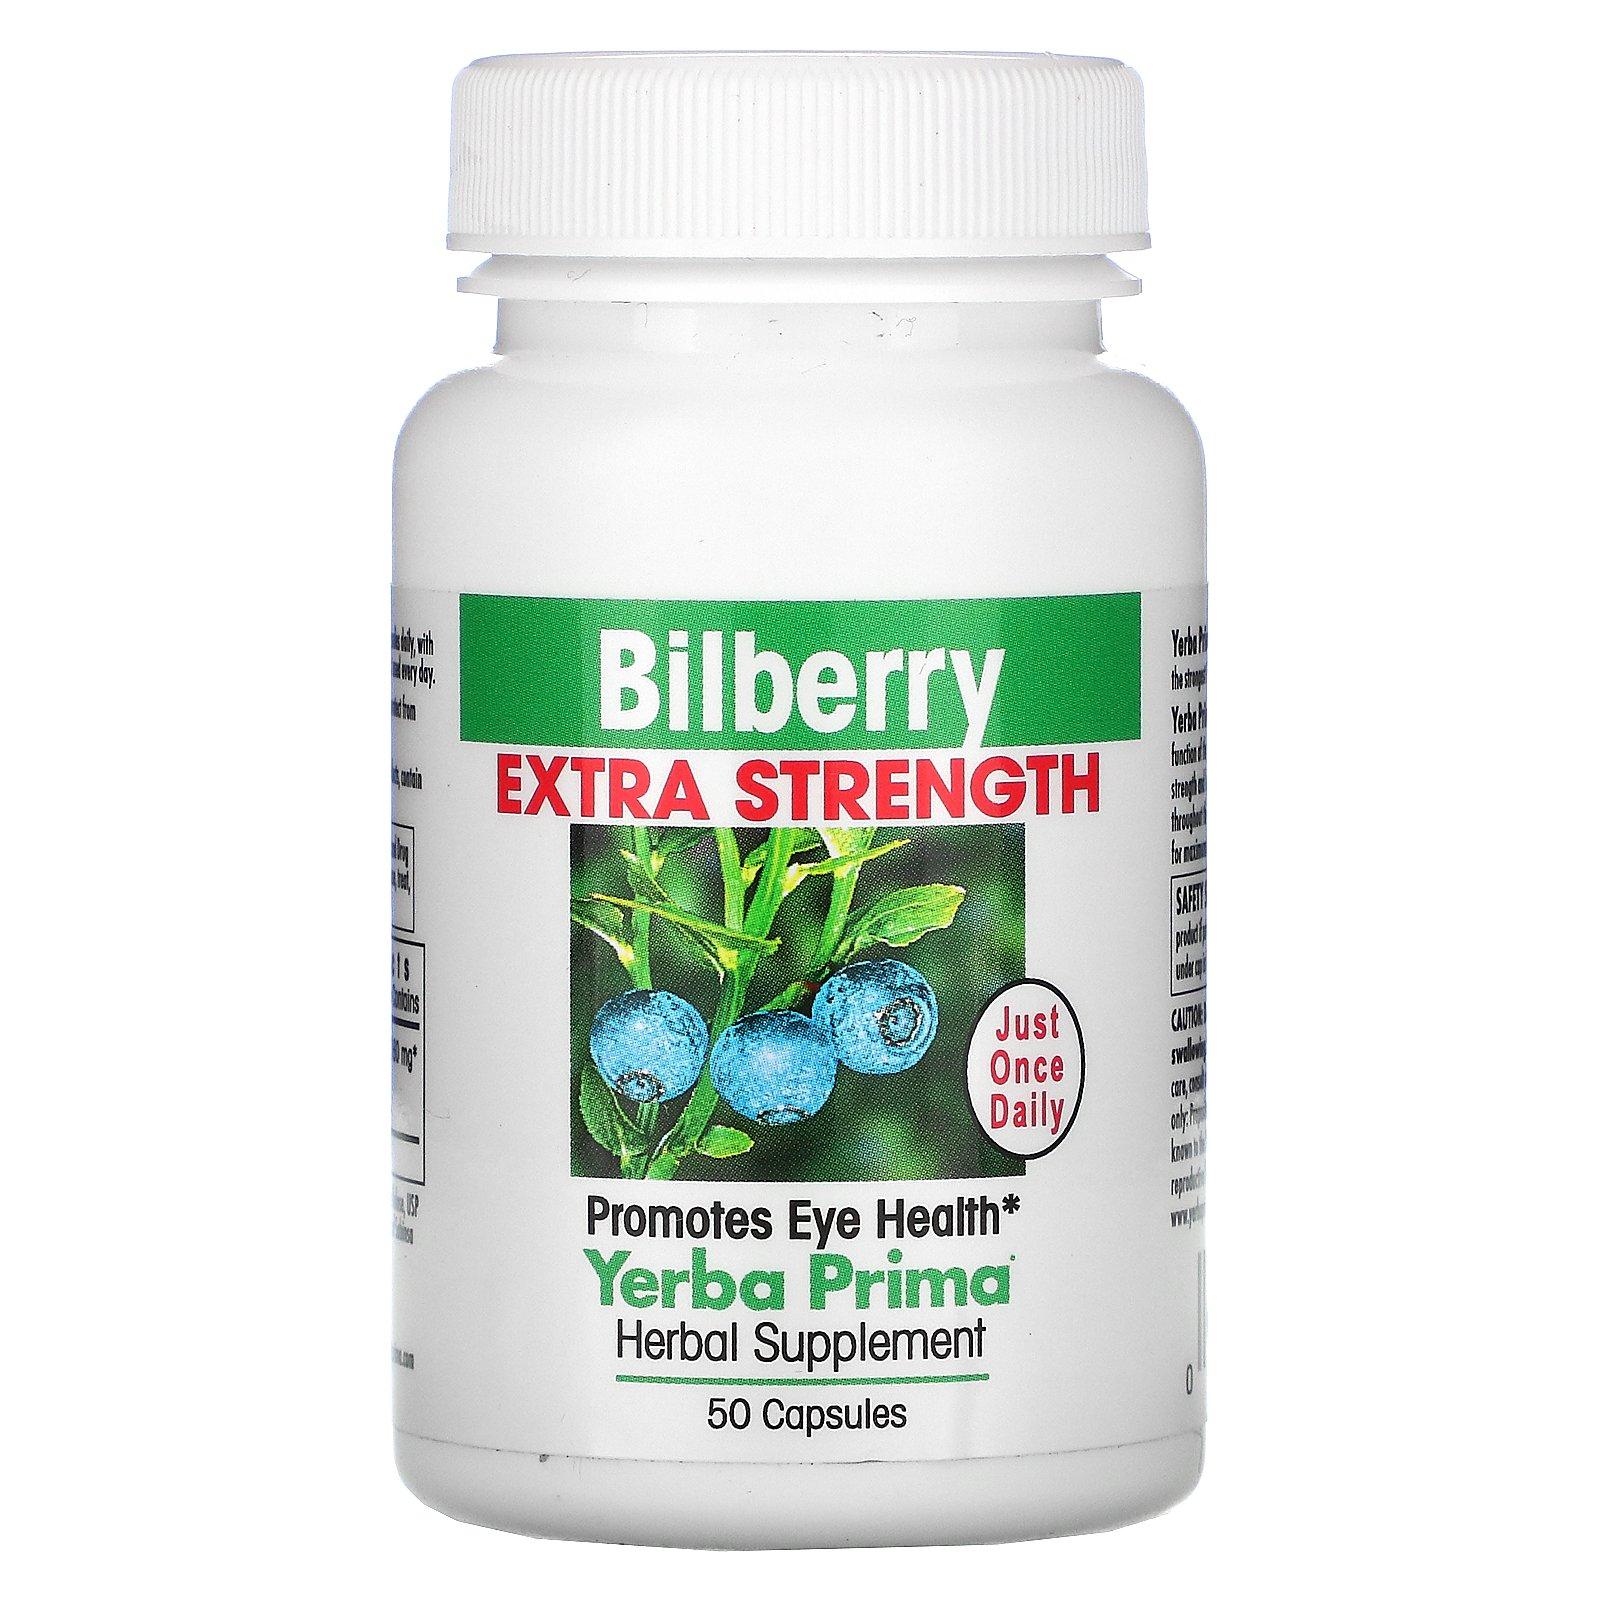 Yerba Prima, Bilberry Extra Strength, 50 Capsules